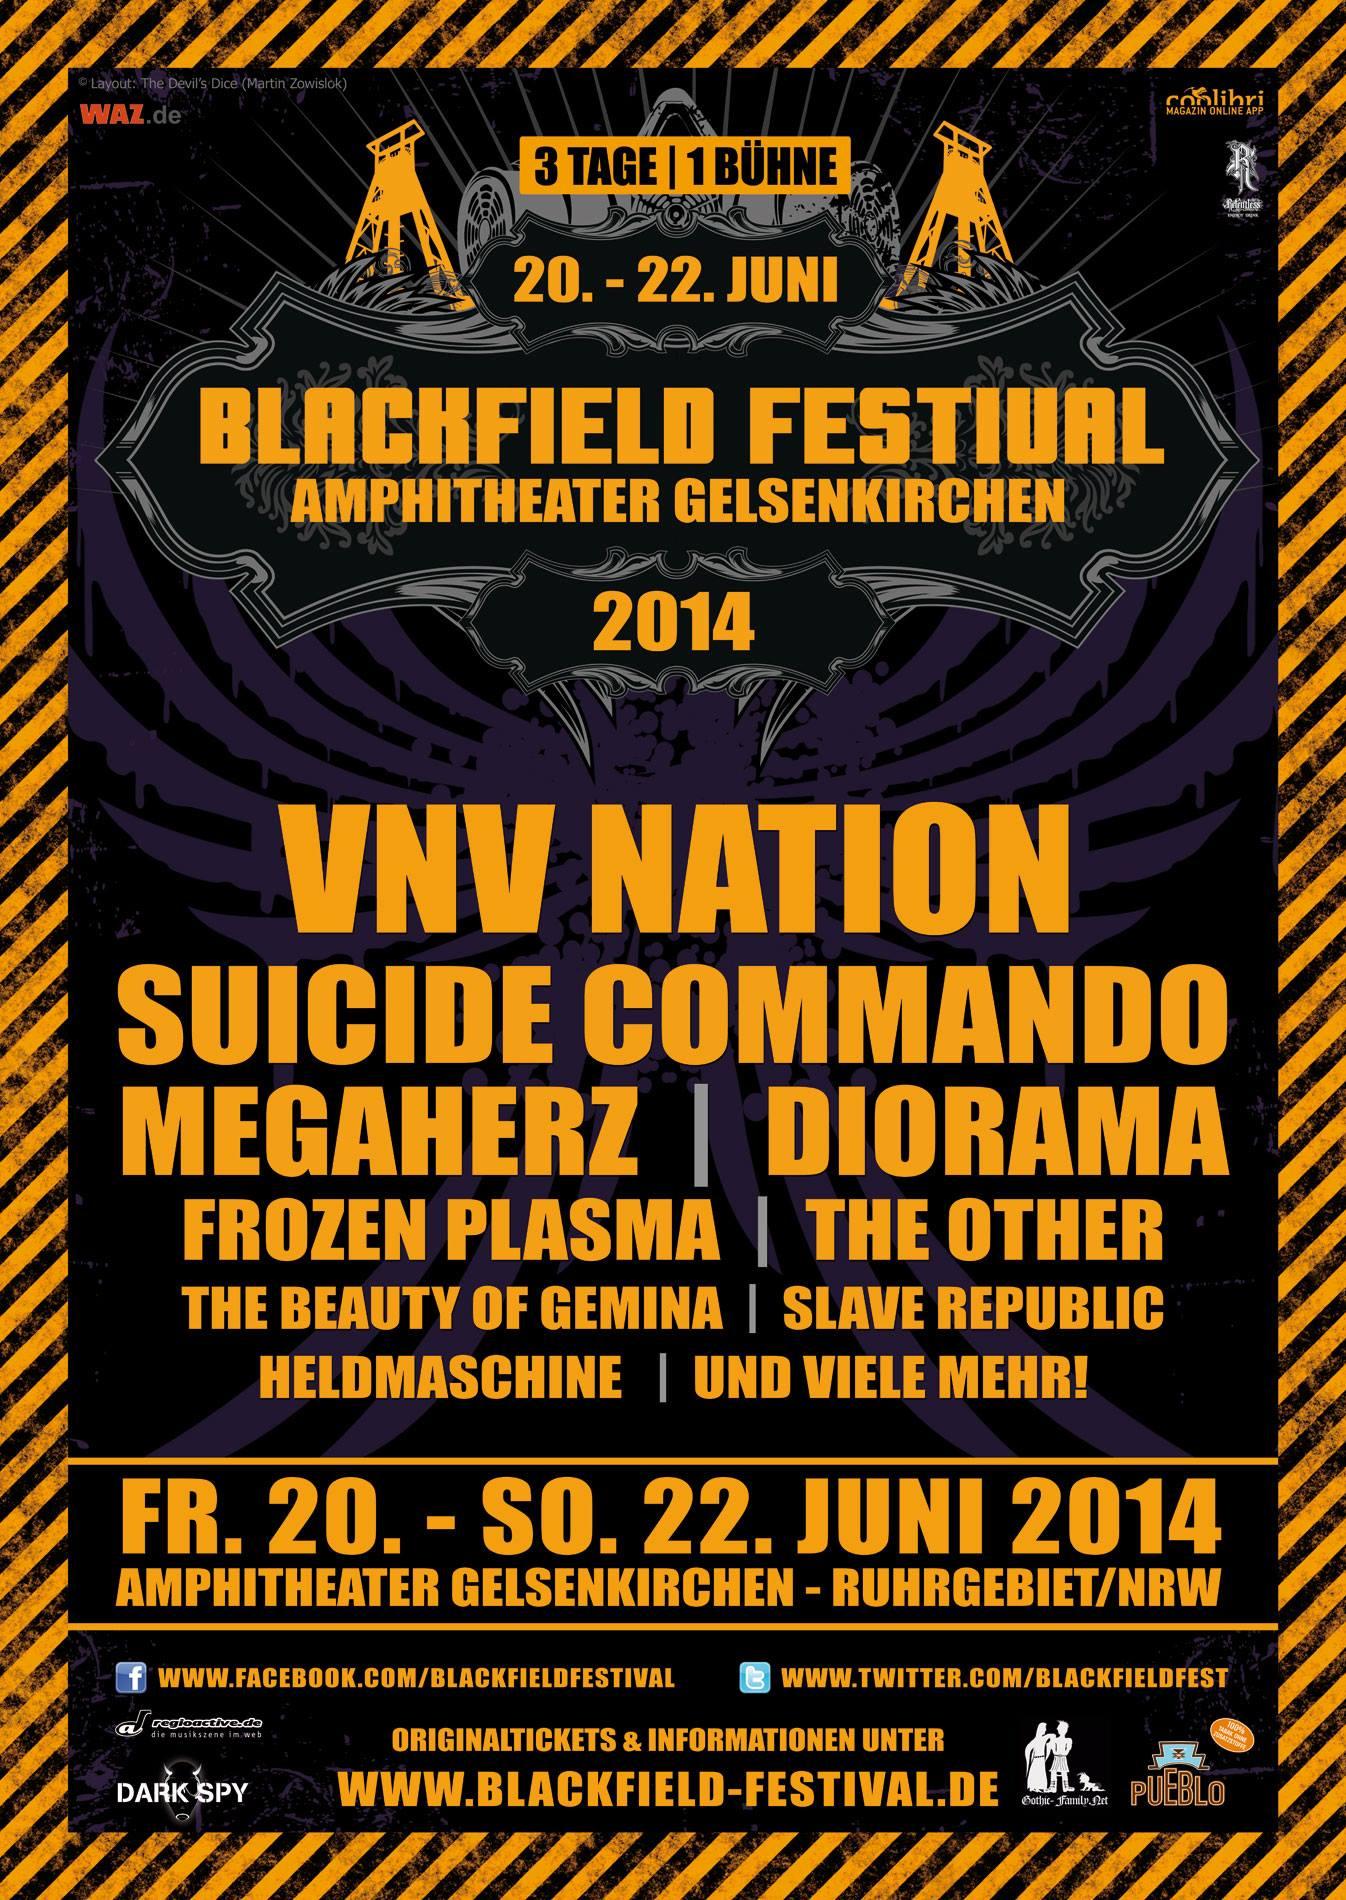 blackfield-festival-2014